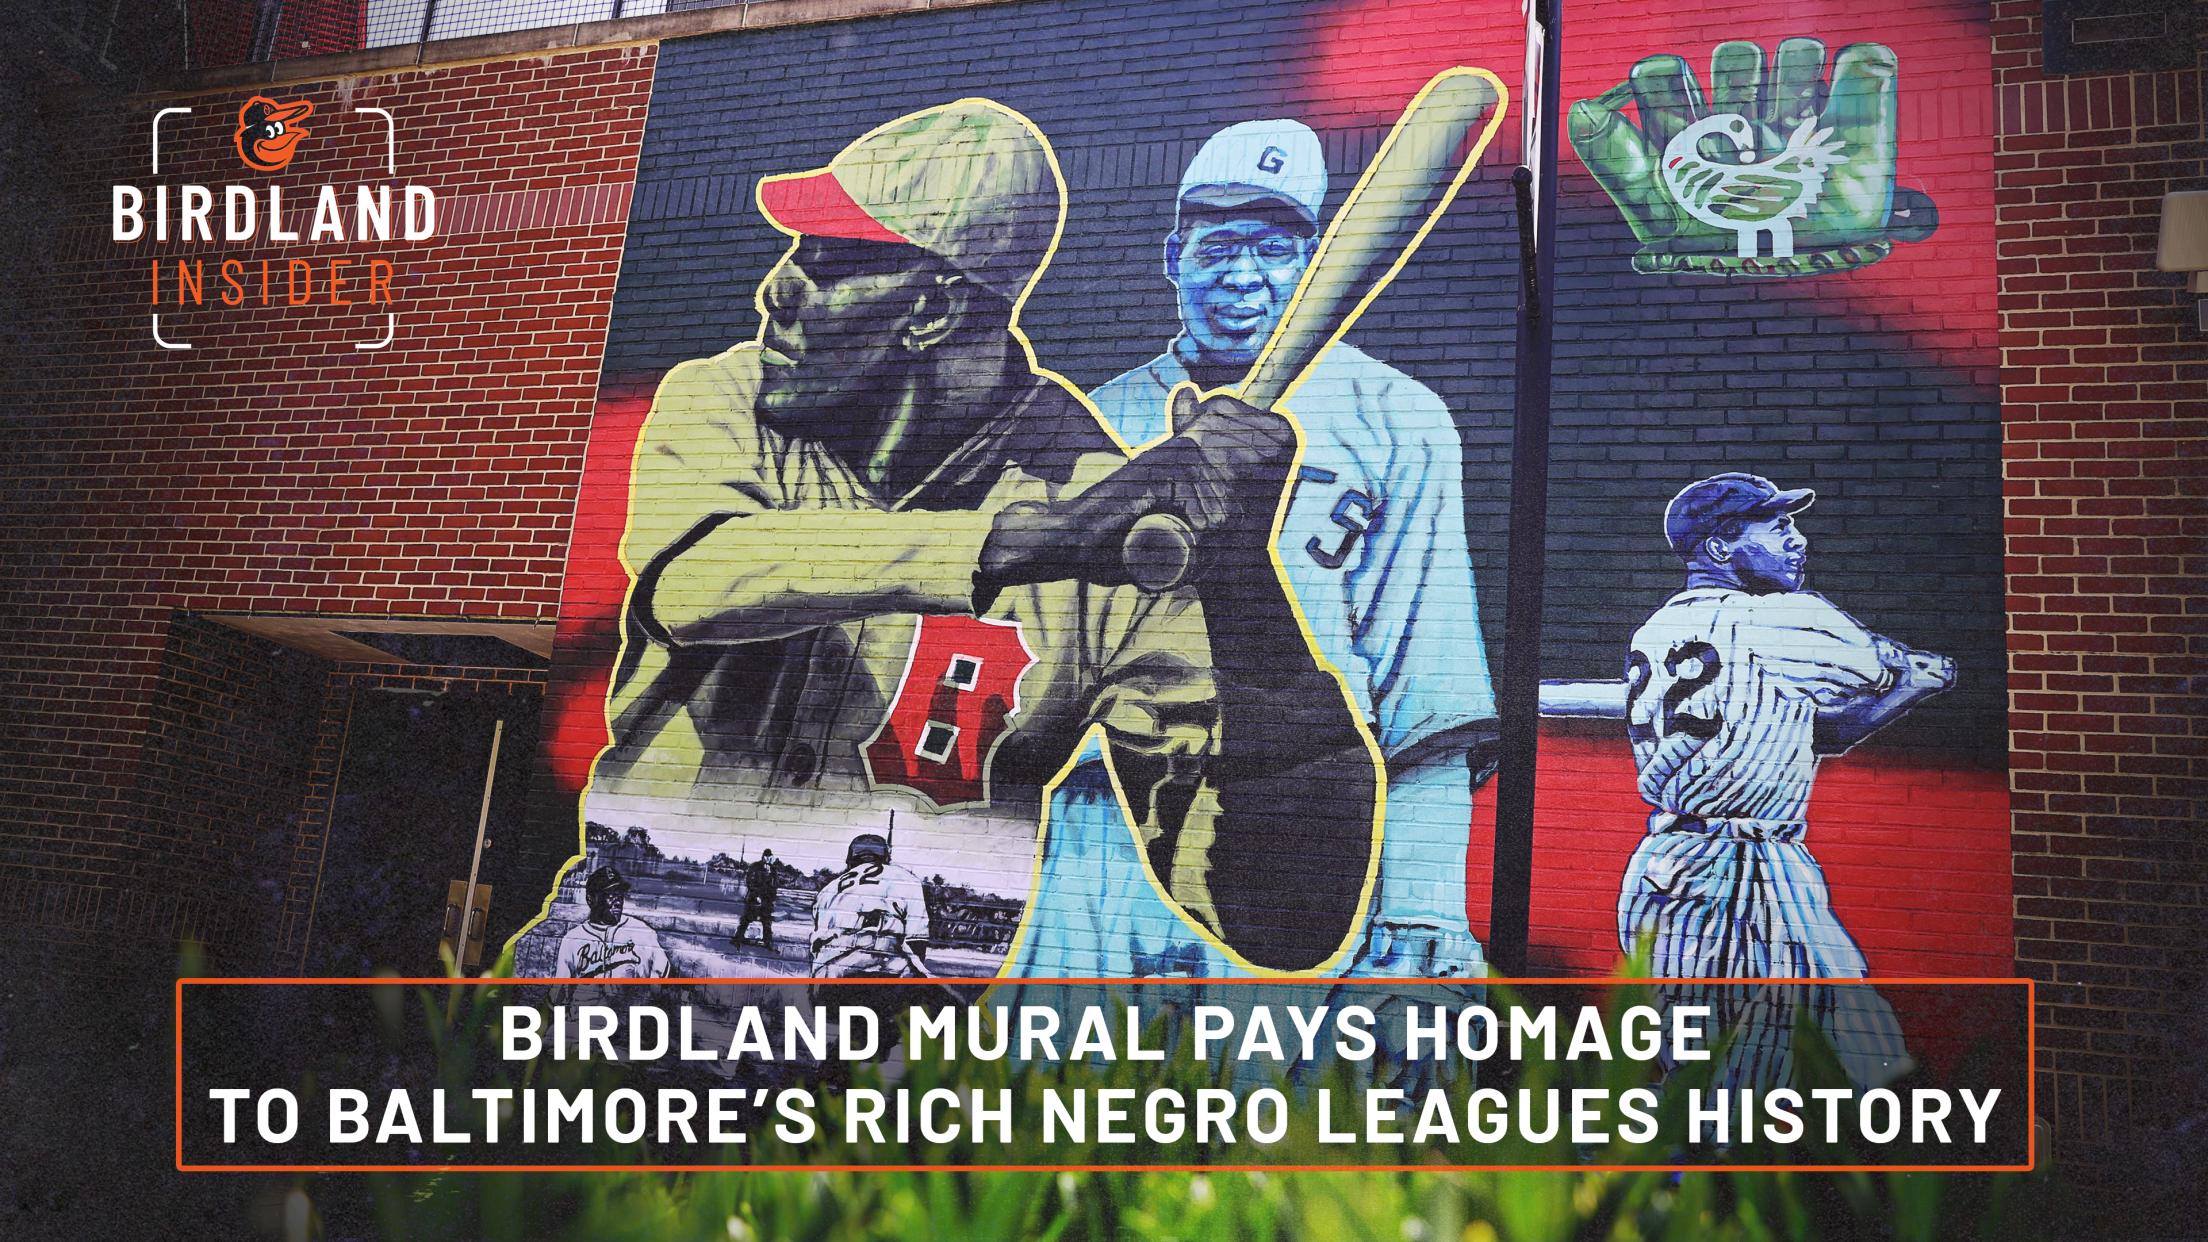 bal-negro-leagues-birdland-mural-3840x2160